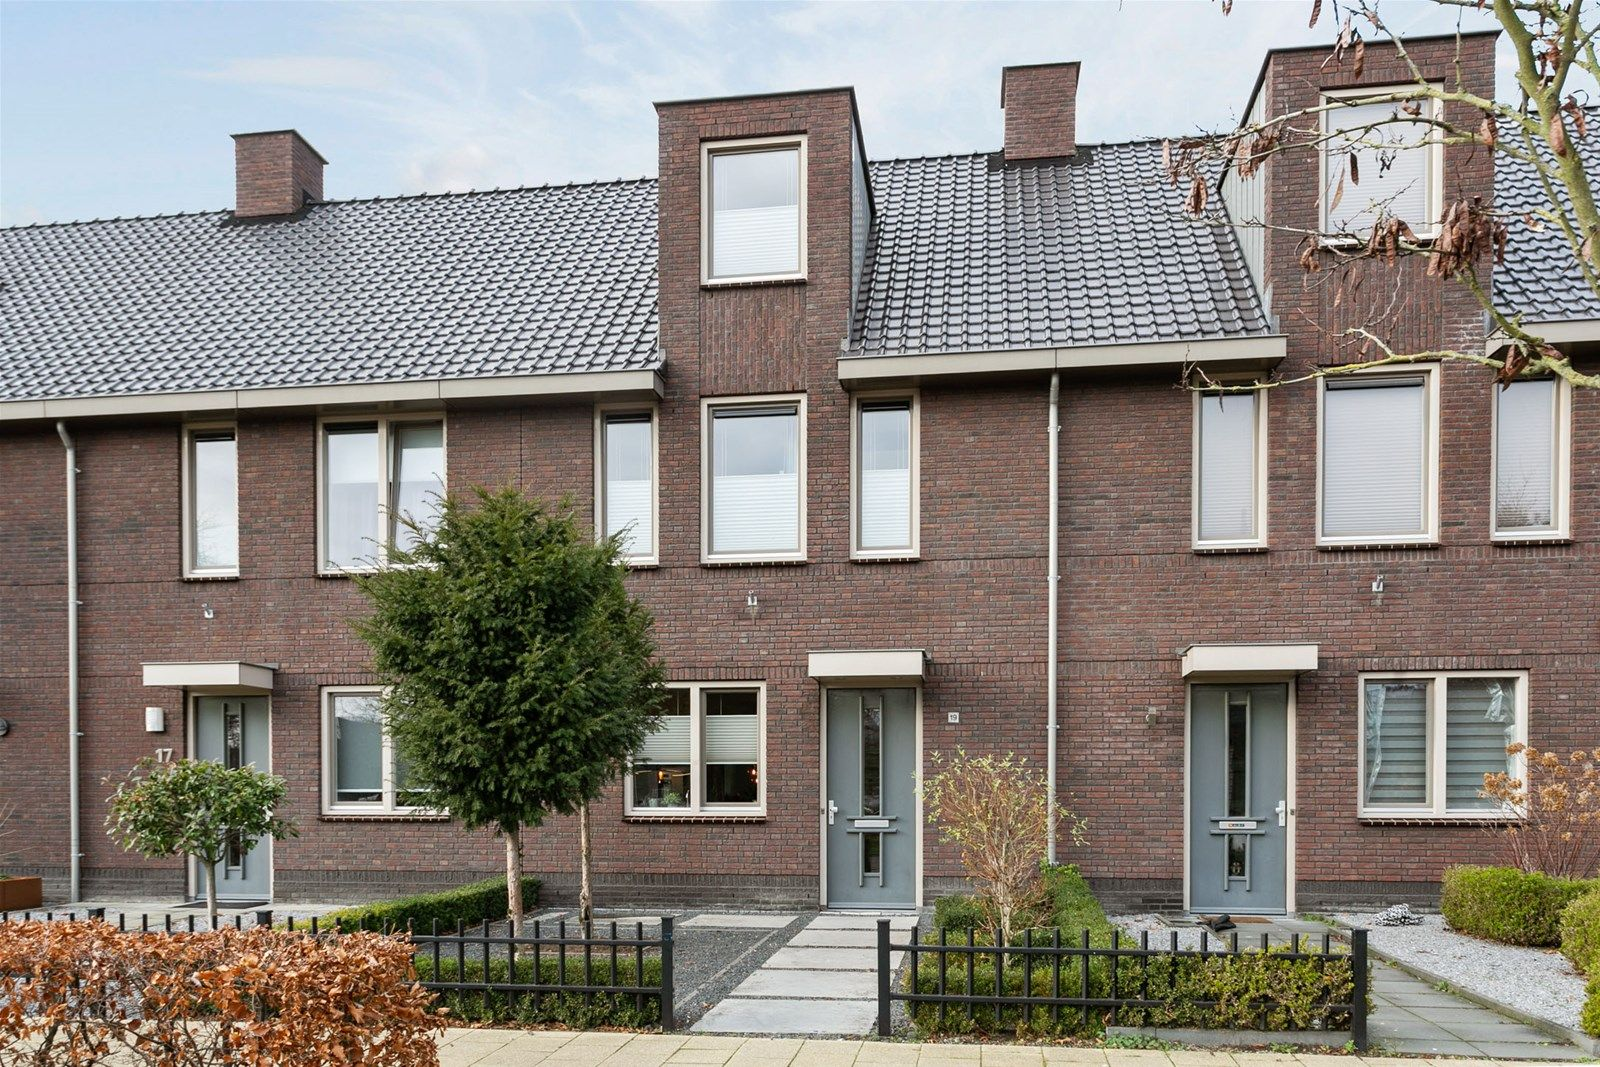 Den Uylstraat 19, Sint-oedenrode